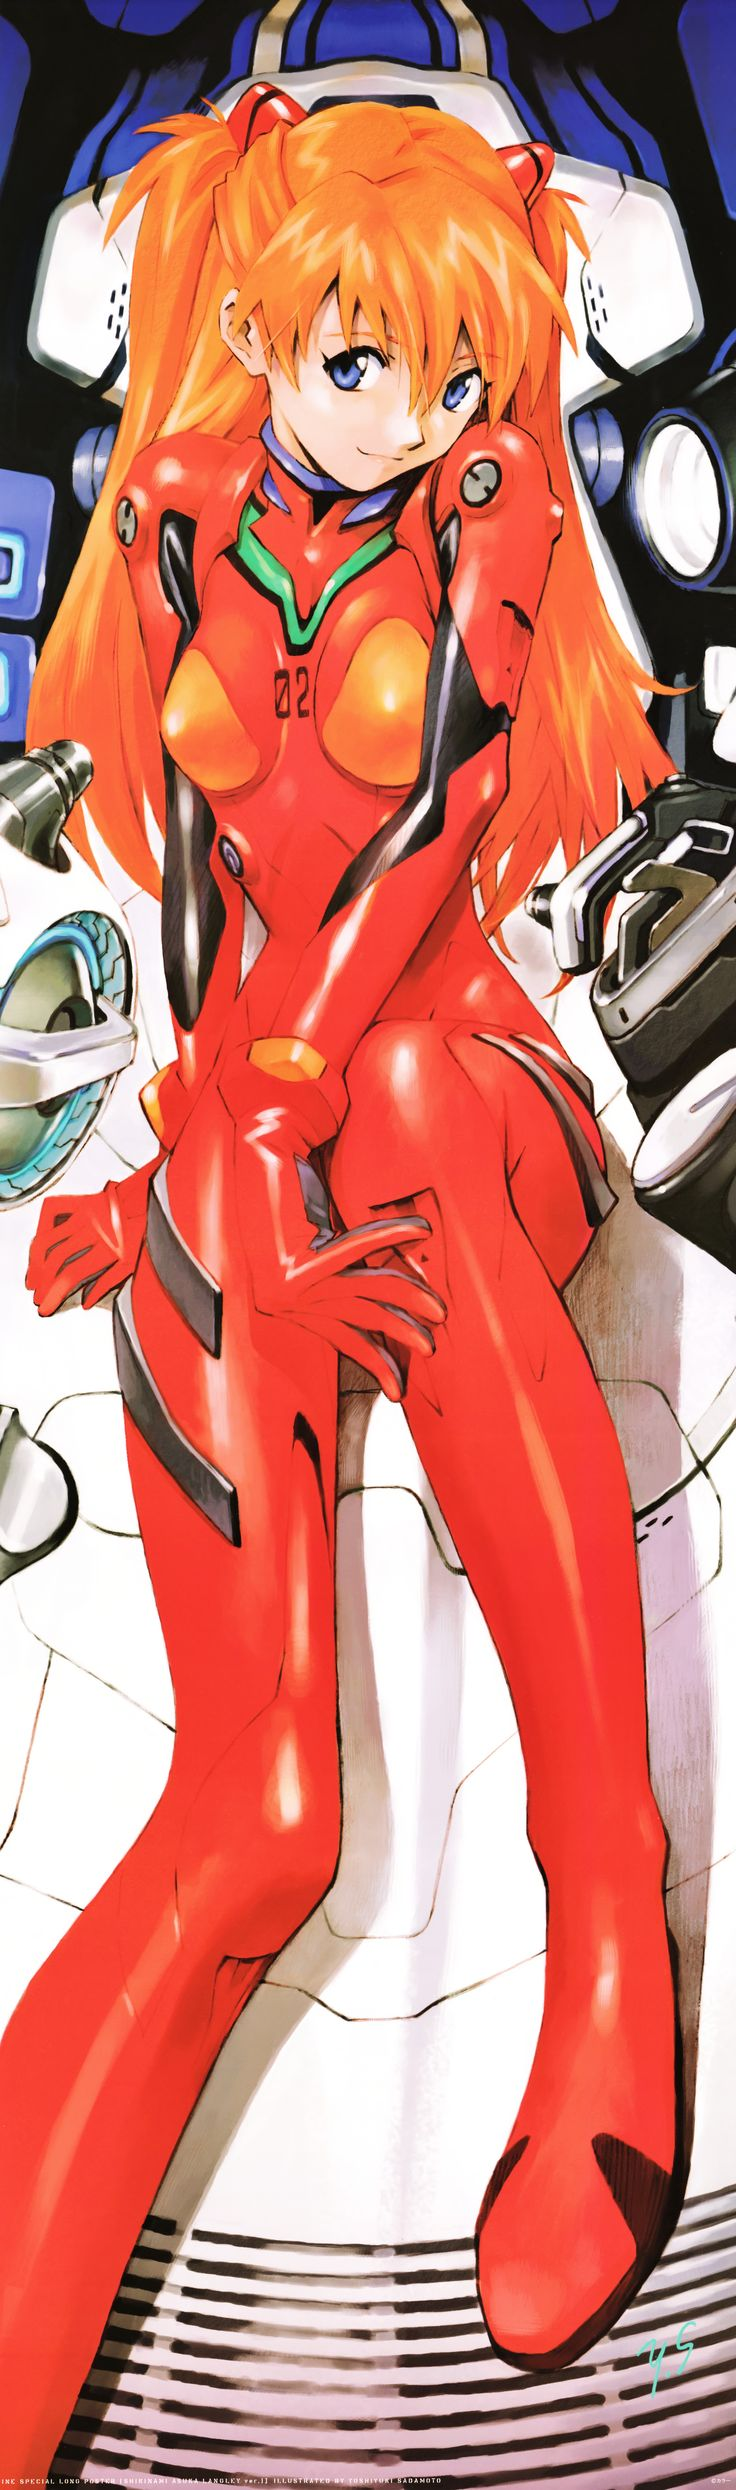 Souryuu Asuka Langley by Yoshiyuki Sadamoto (character designer for Evangelion and co-founder of GAINAX Studio) and Hideaki Anno (writer and director of Neon Genesis Evangelion and co-founder of GAINAX Studio)